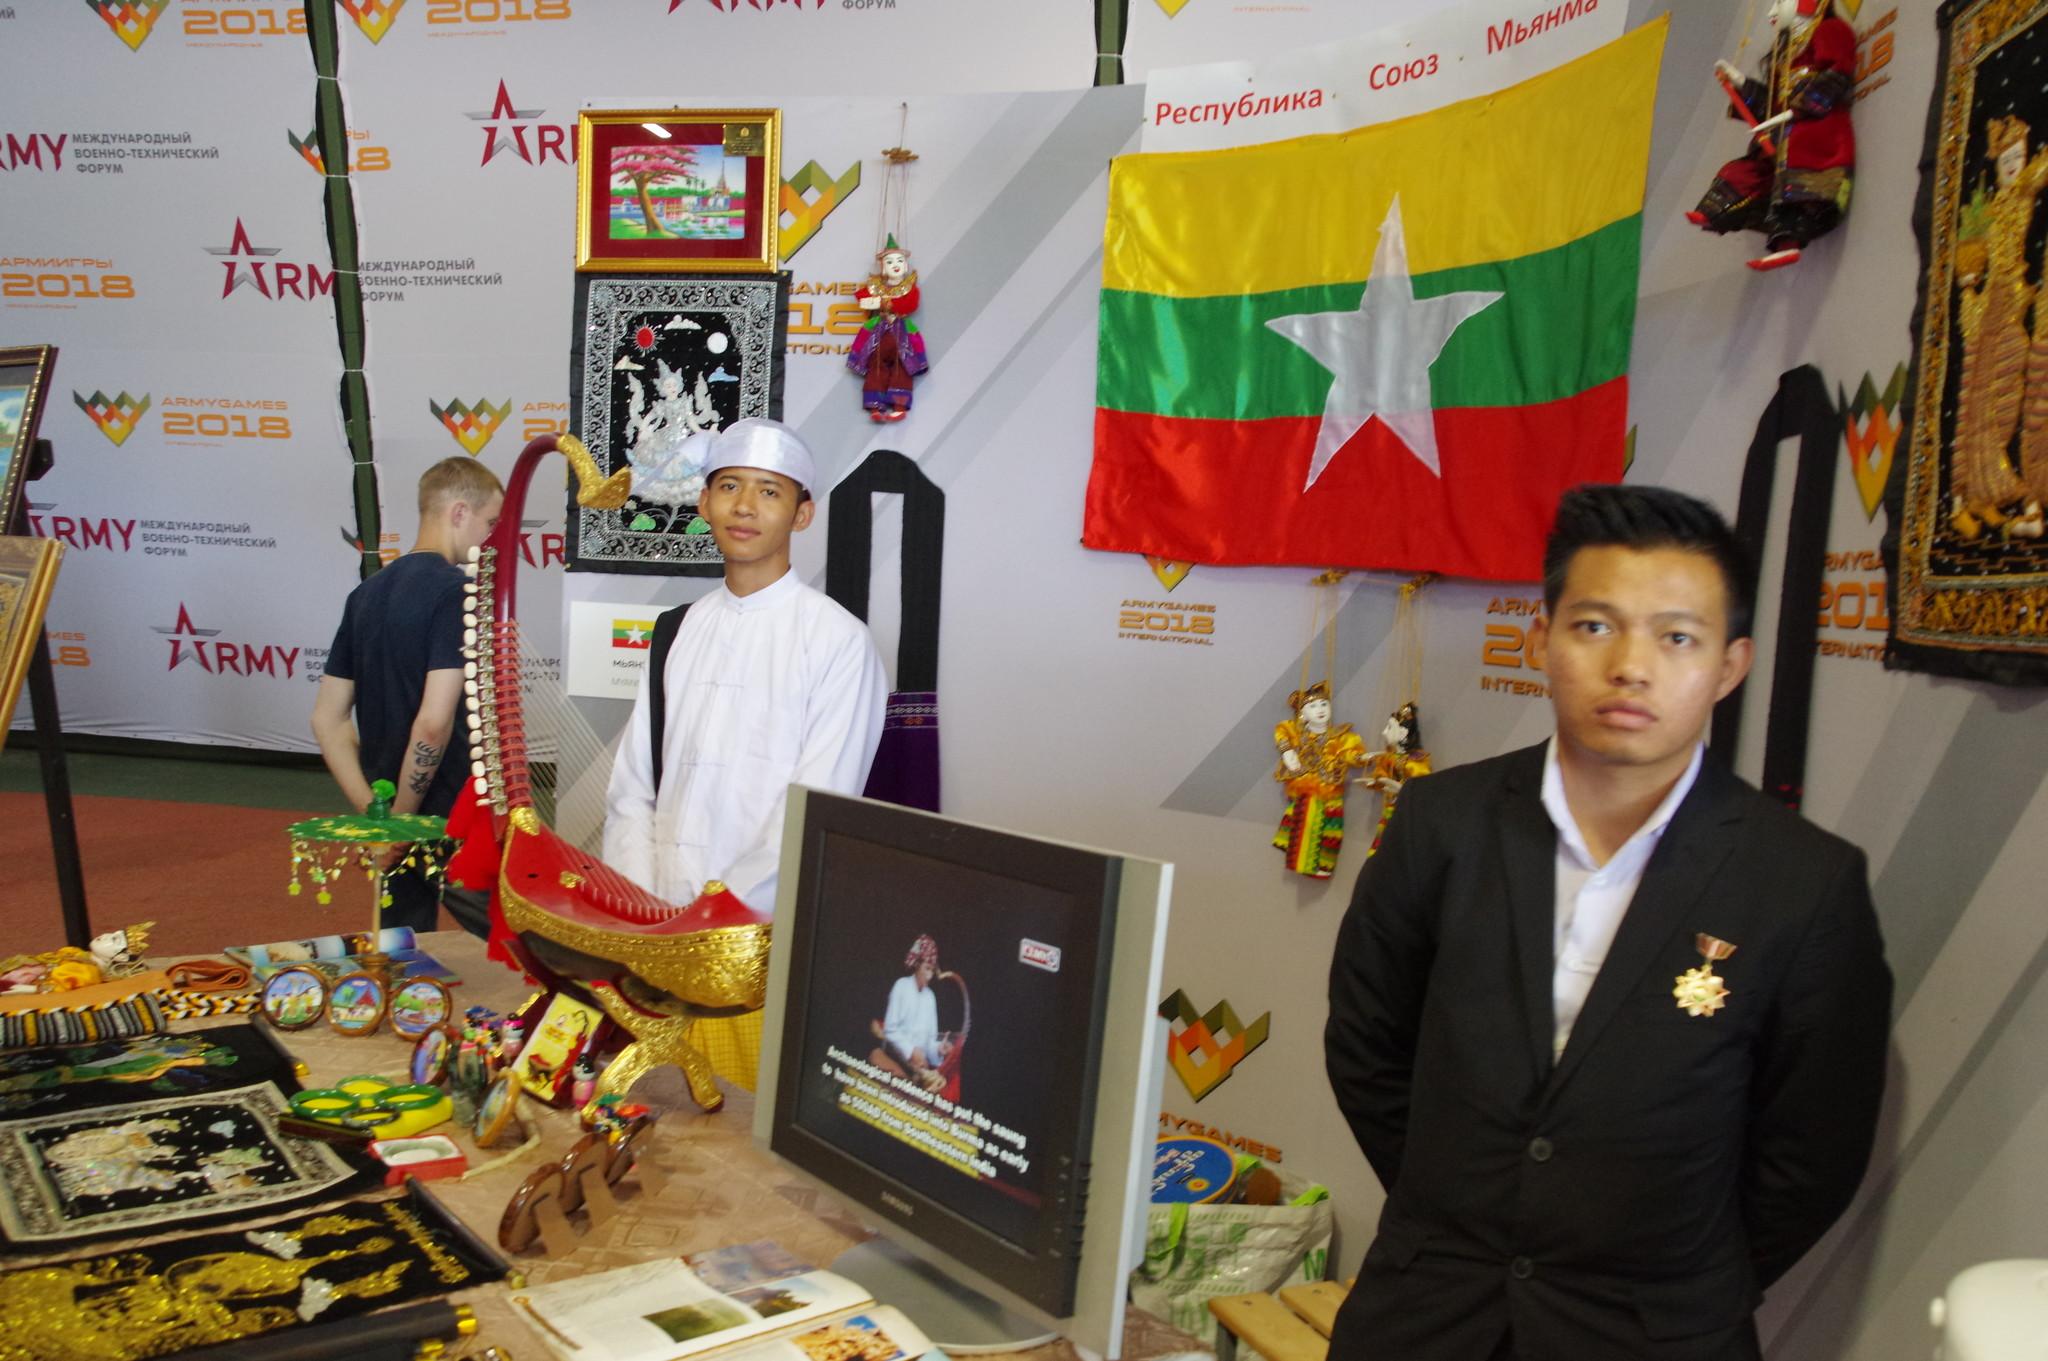 Стенд Мьянмы на Международных армейских играх